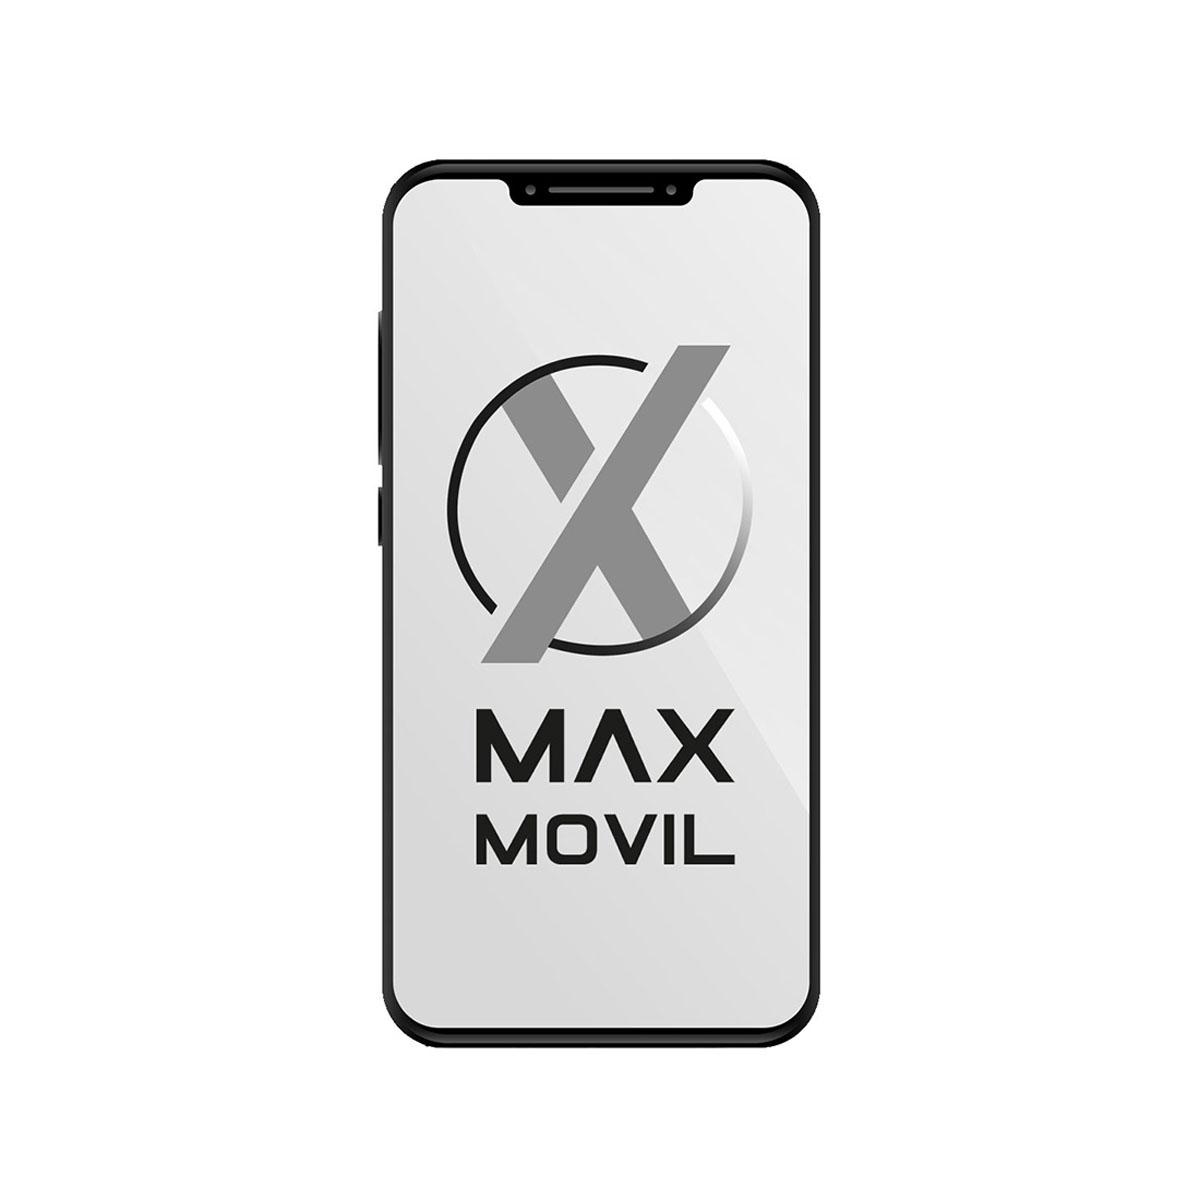 Tablet Huawei MediaPad M5 10.8 Wifi 32GB Gris